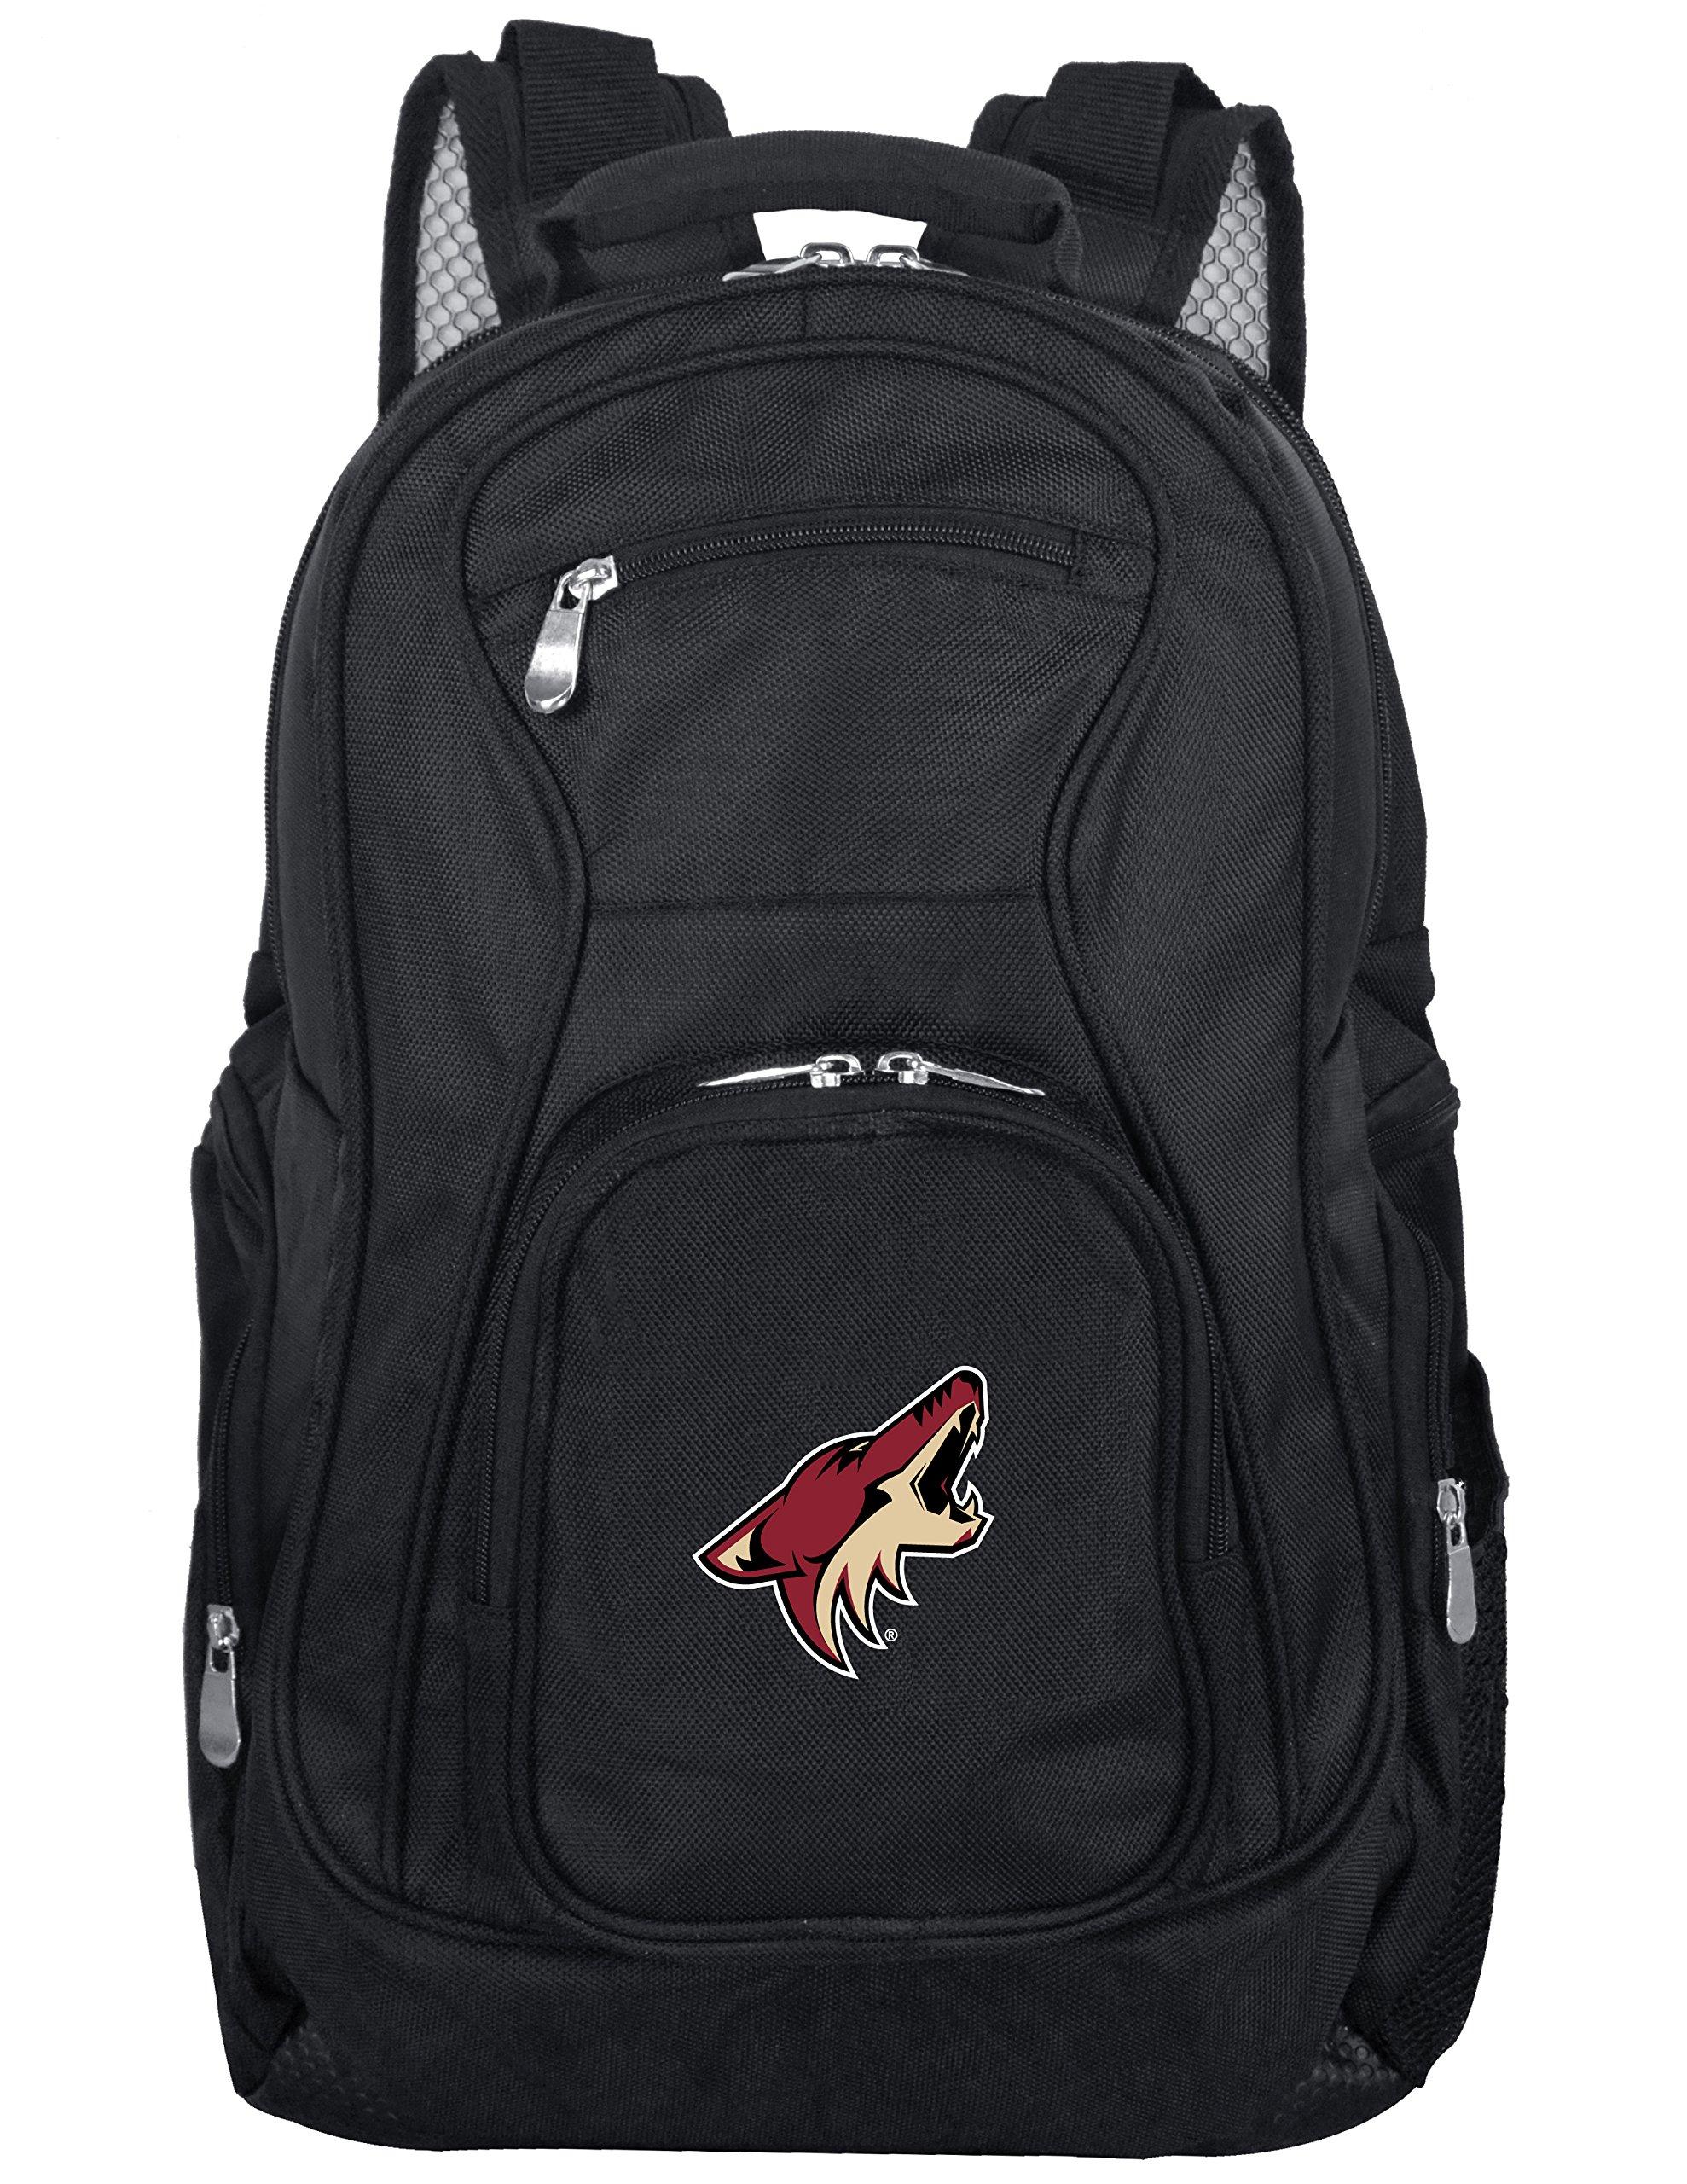 Denco NHL Arizona Coyotes Voyager Laptop Backpack, 19-inches, Black